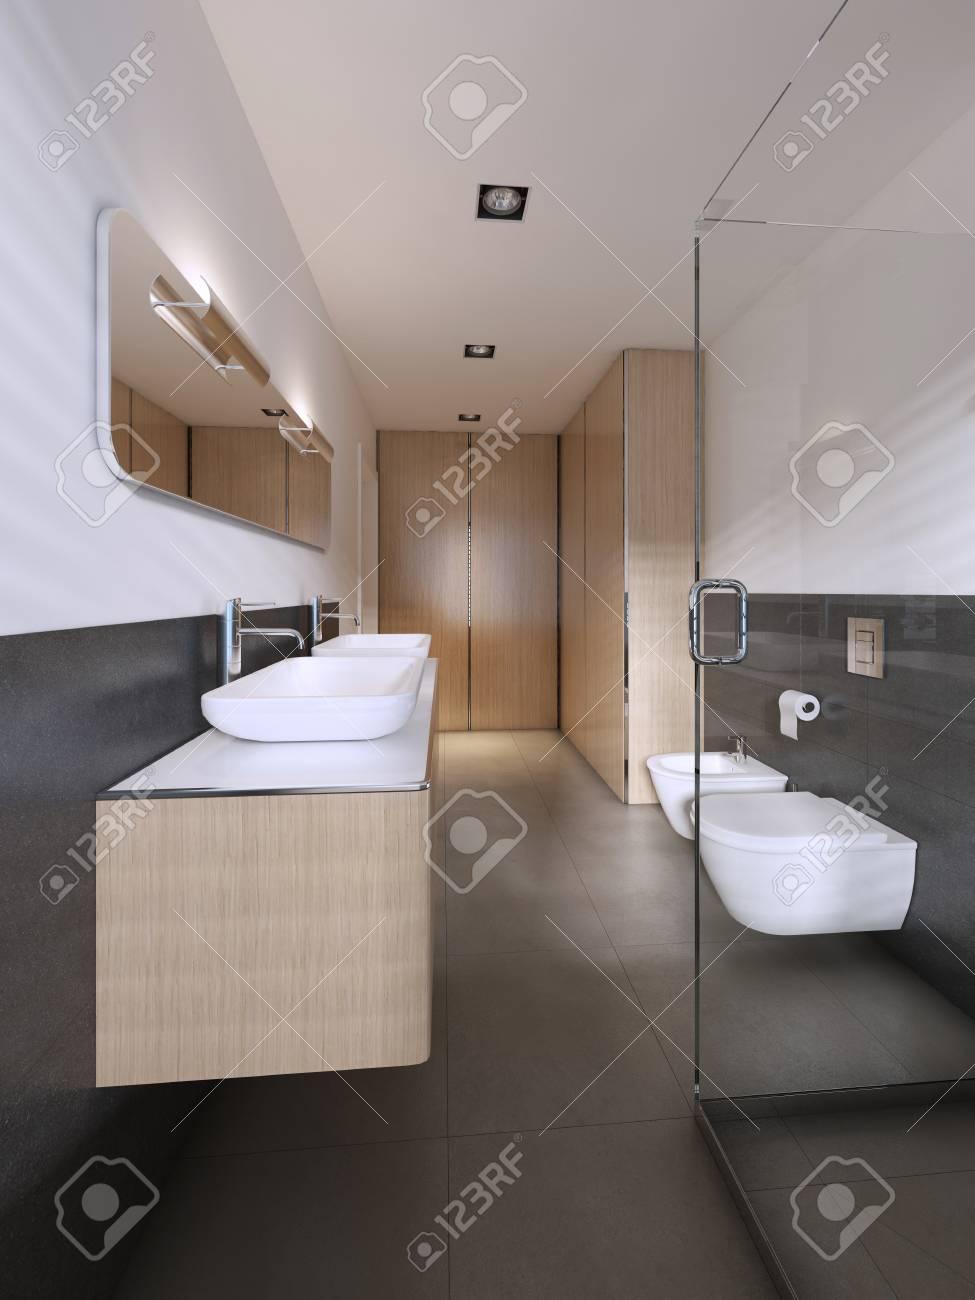 Modern bathroom in scandinavian style with wooden furniture 3d rendering stock photo 113303193